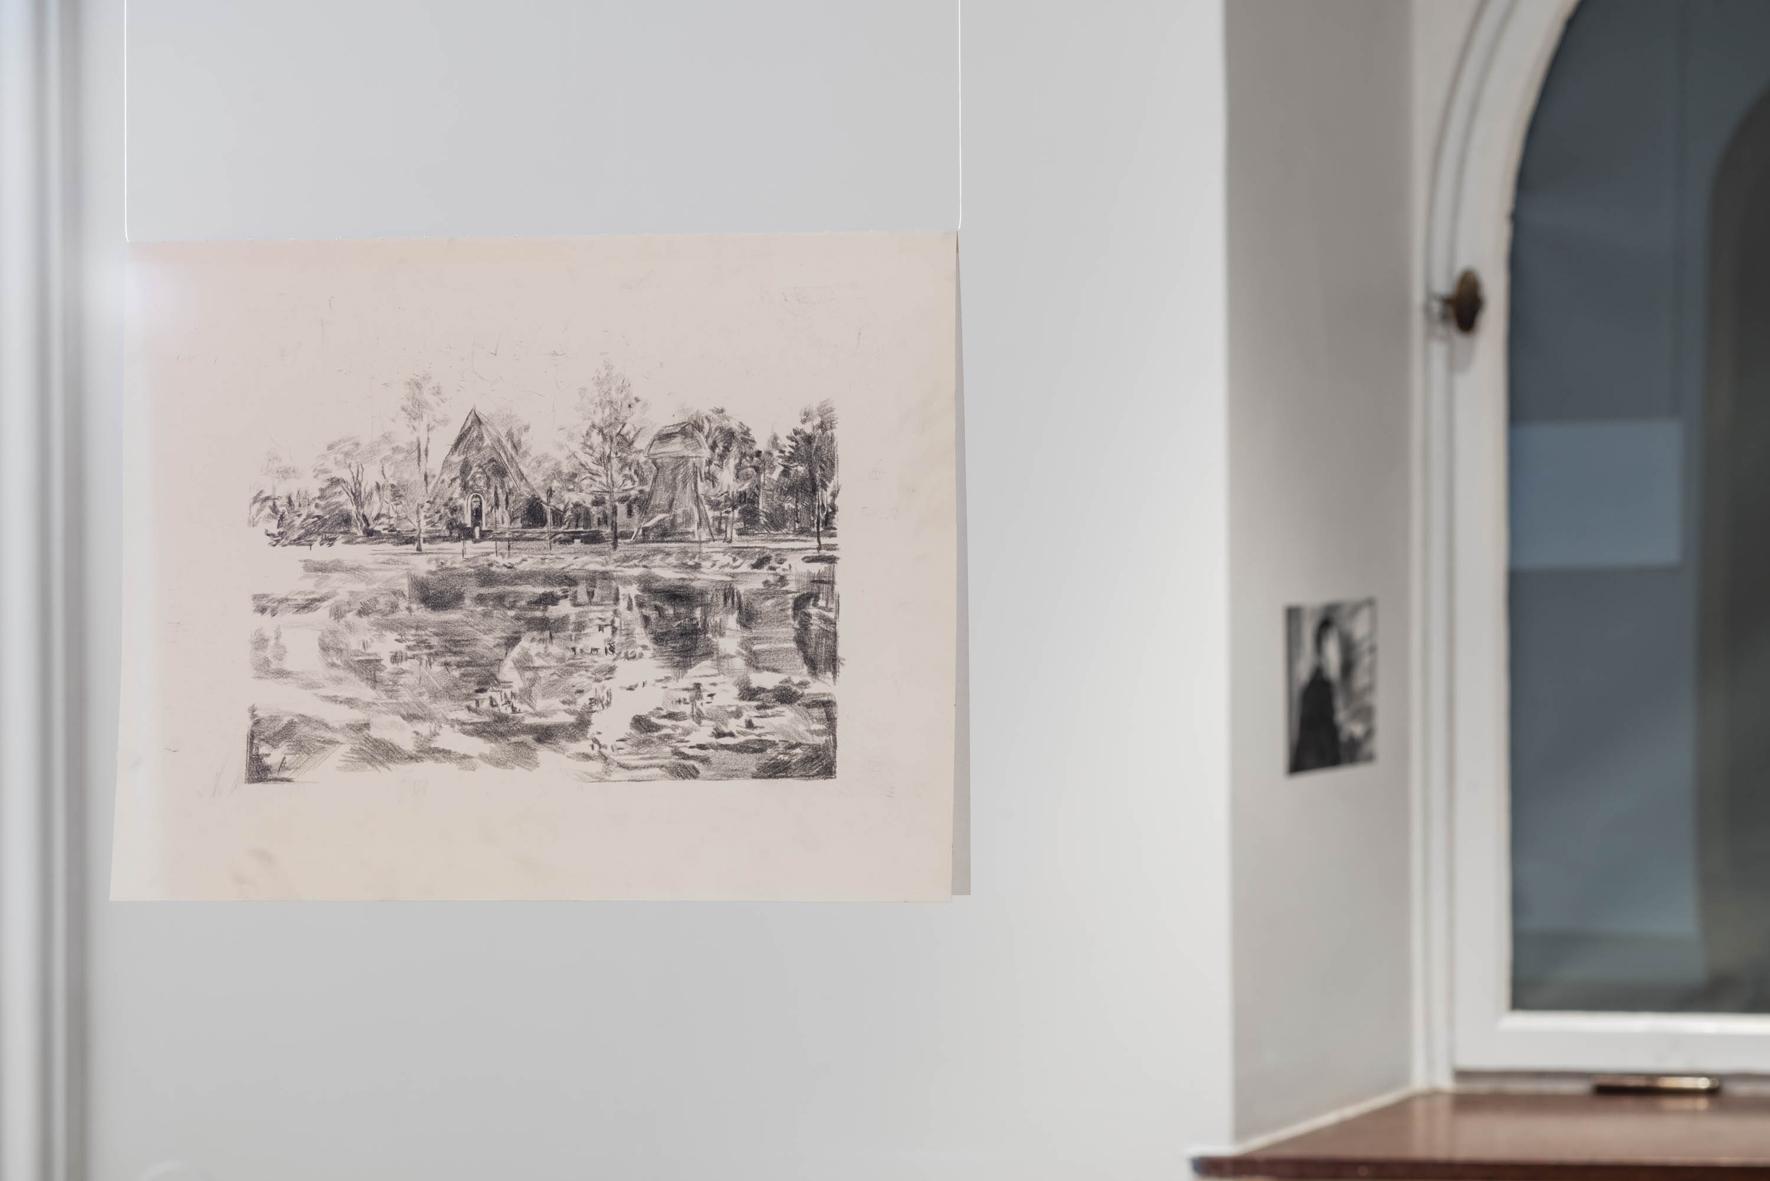 ESTABLISHING SHOT (Winter light) (2015) Pencil and carbon on paper, 36x28 cm, Exhibition view, Image copyright: Jean Baptiste Béranger, courtesy of the Romanian Cultural Institute